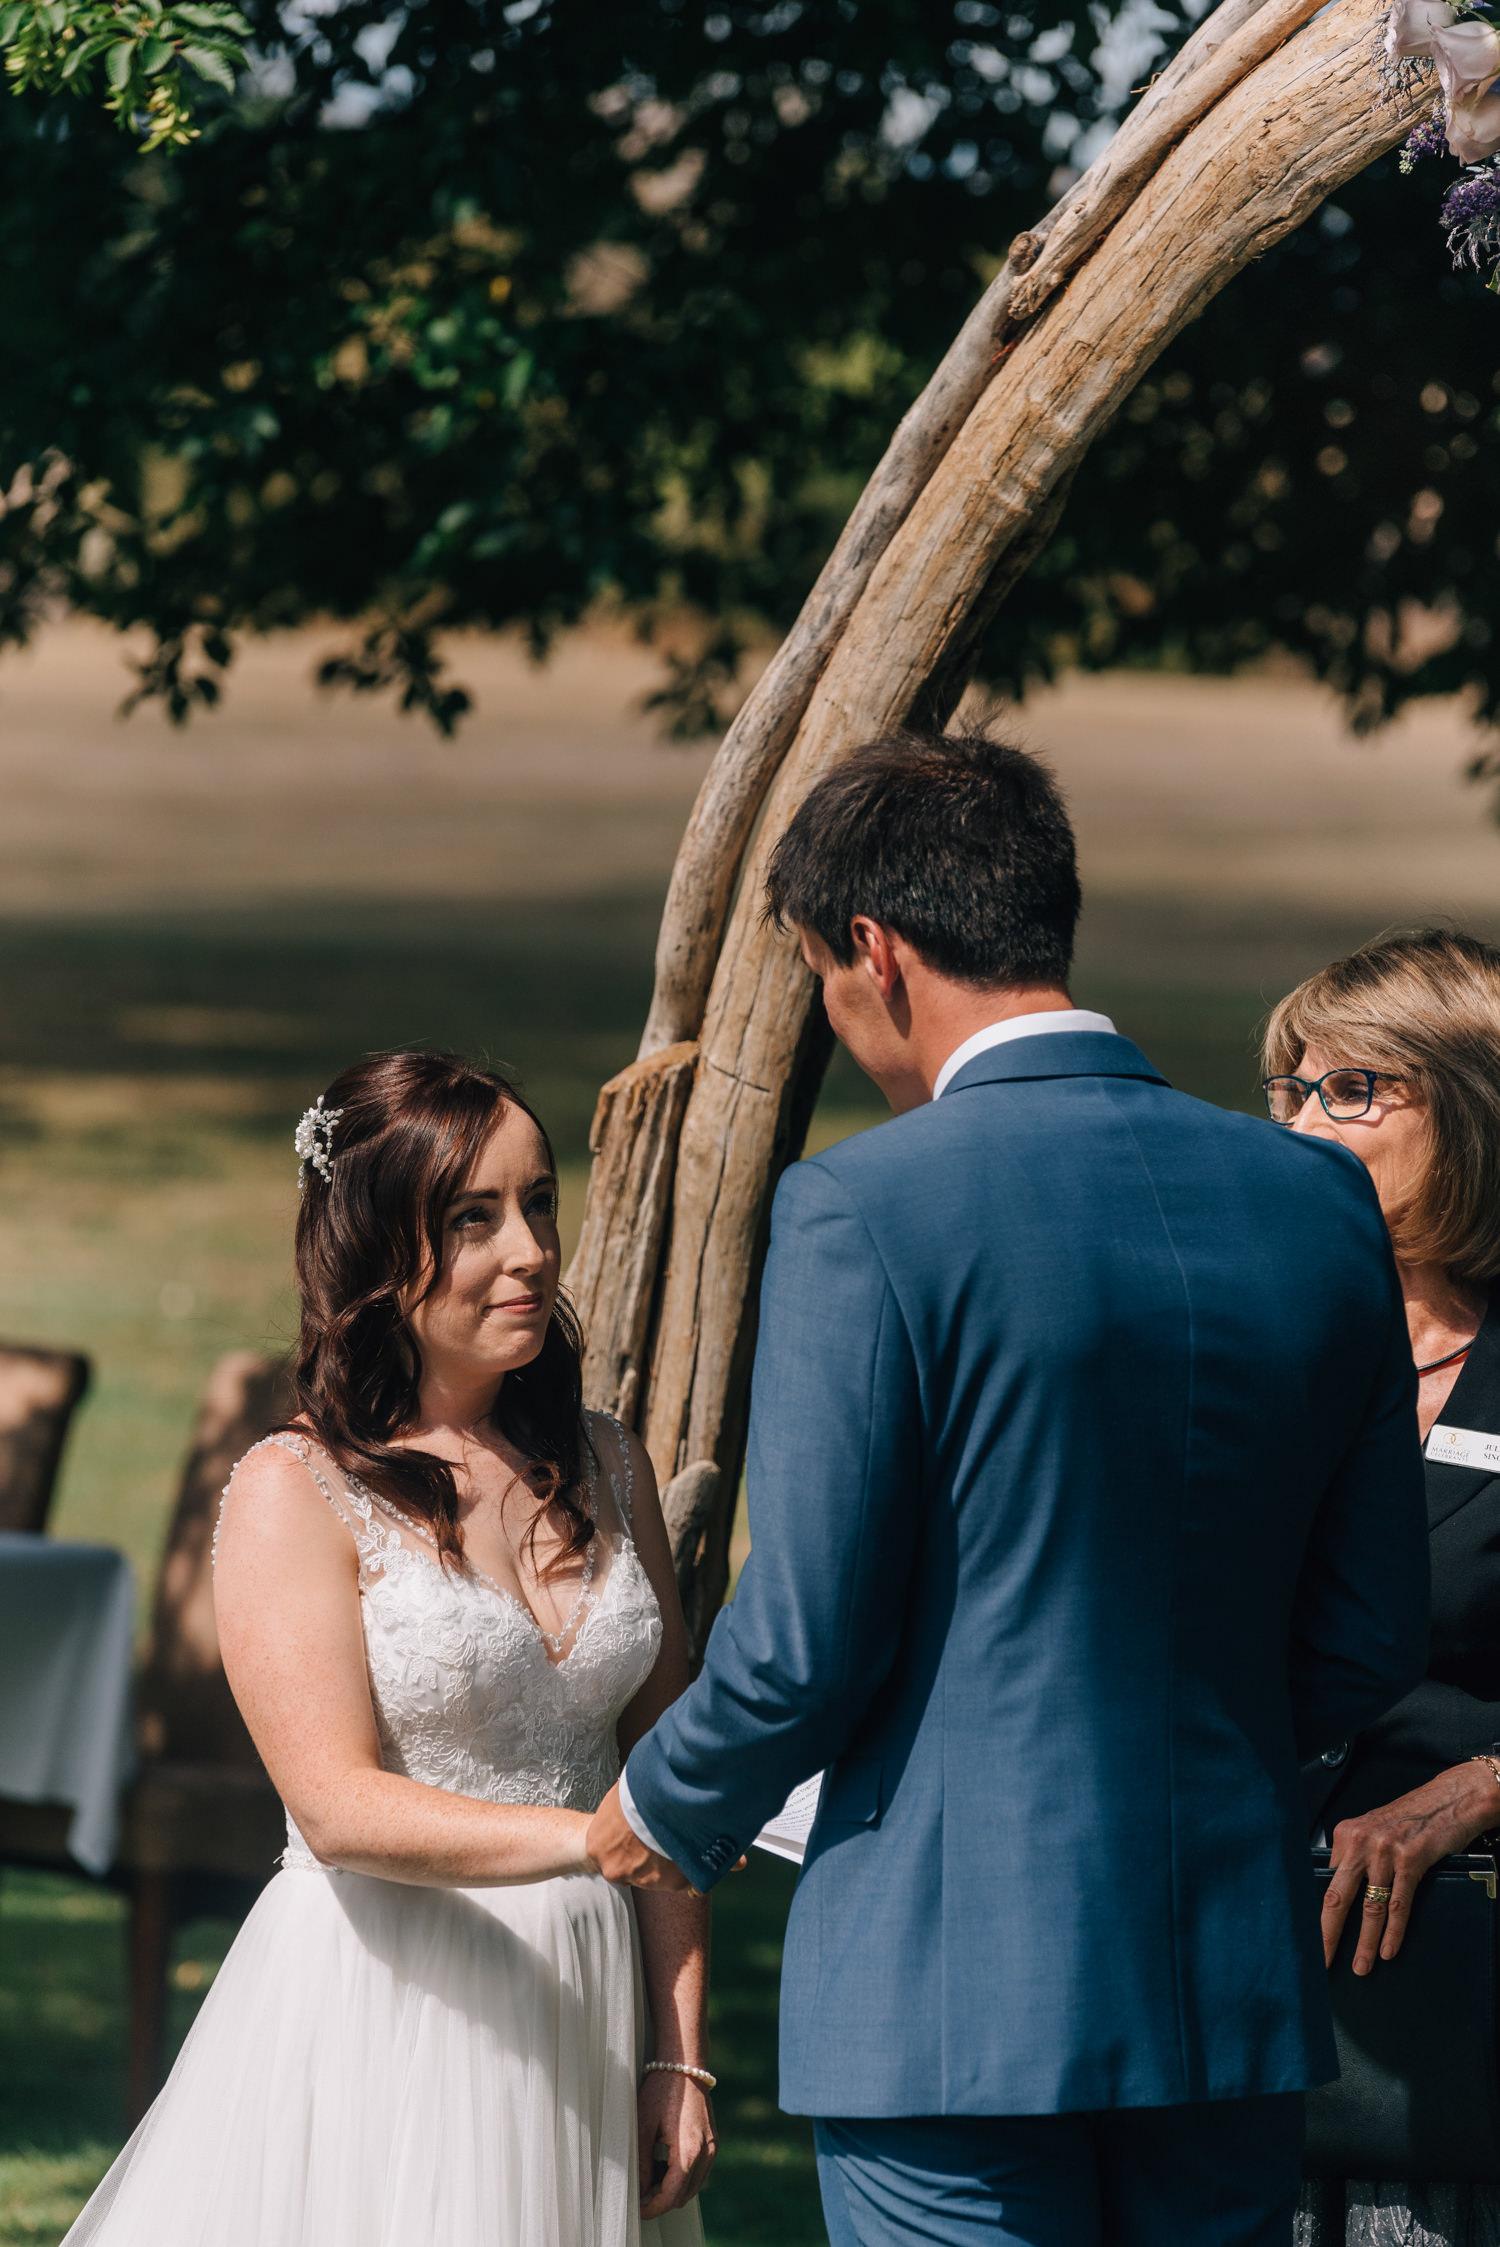 Quamby-Wedding-Photographer-79.jpg